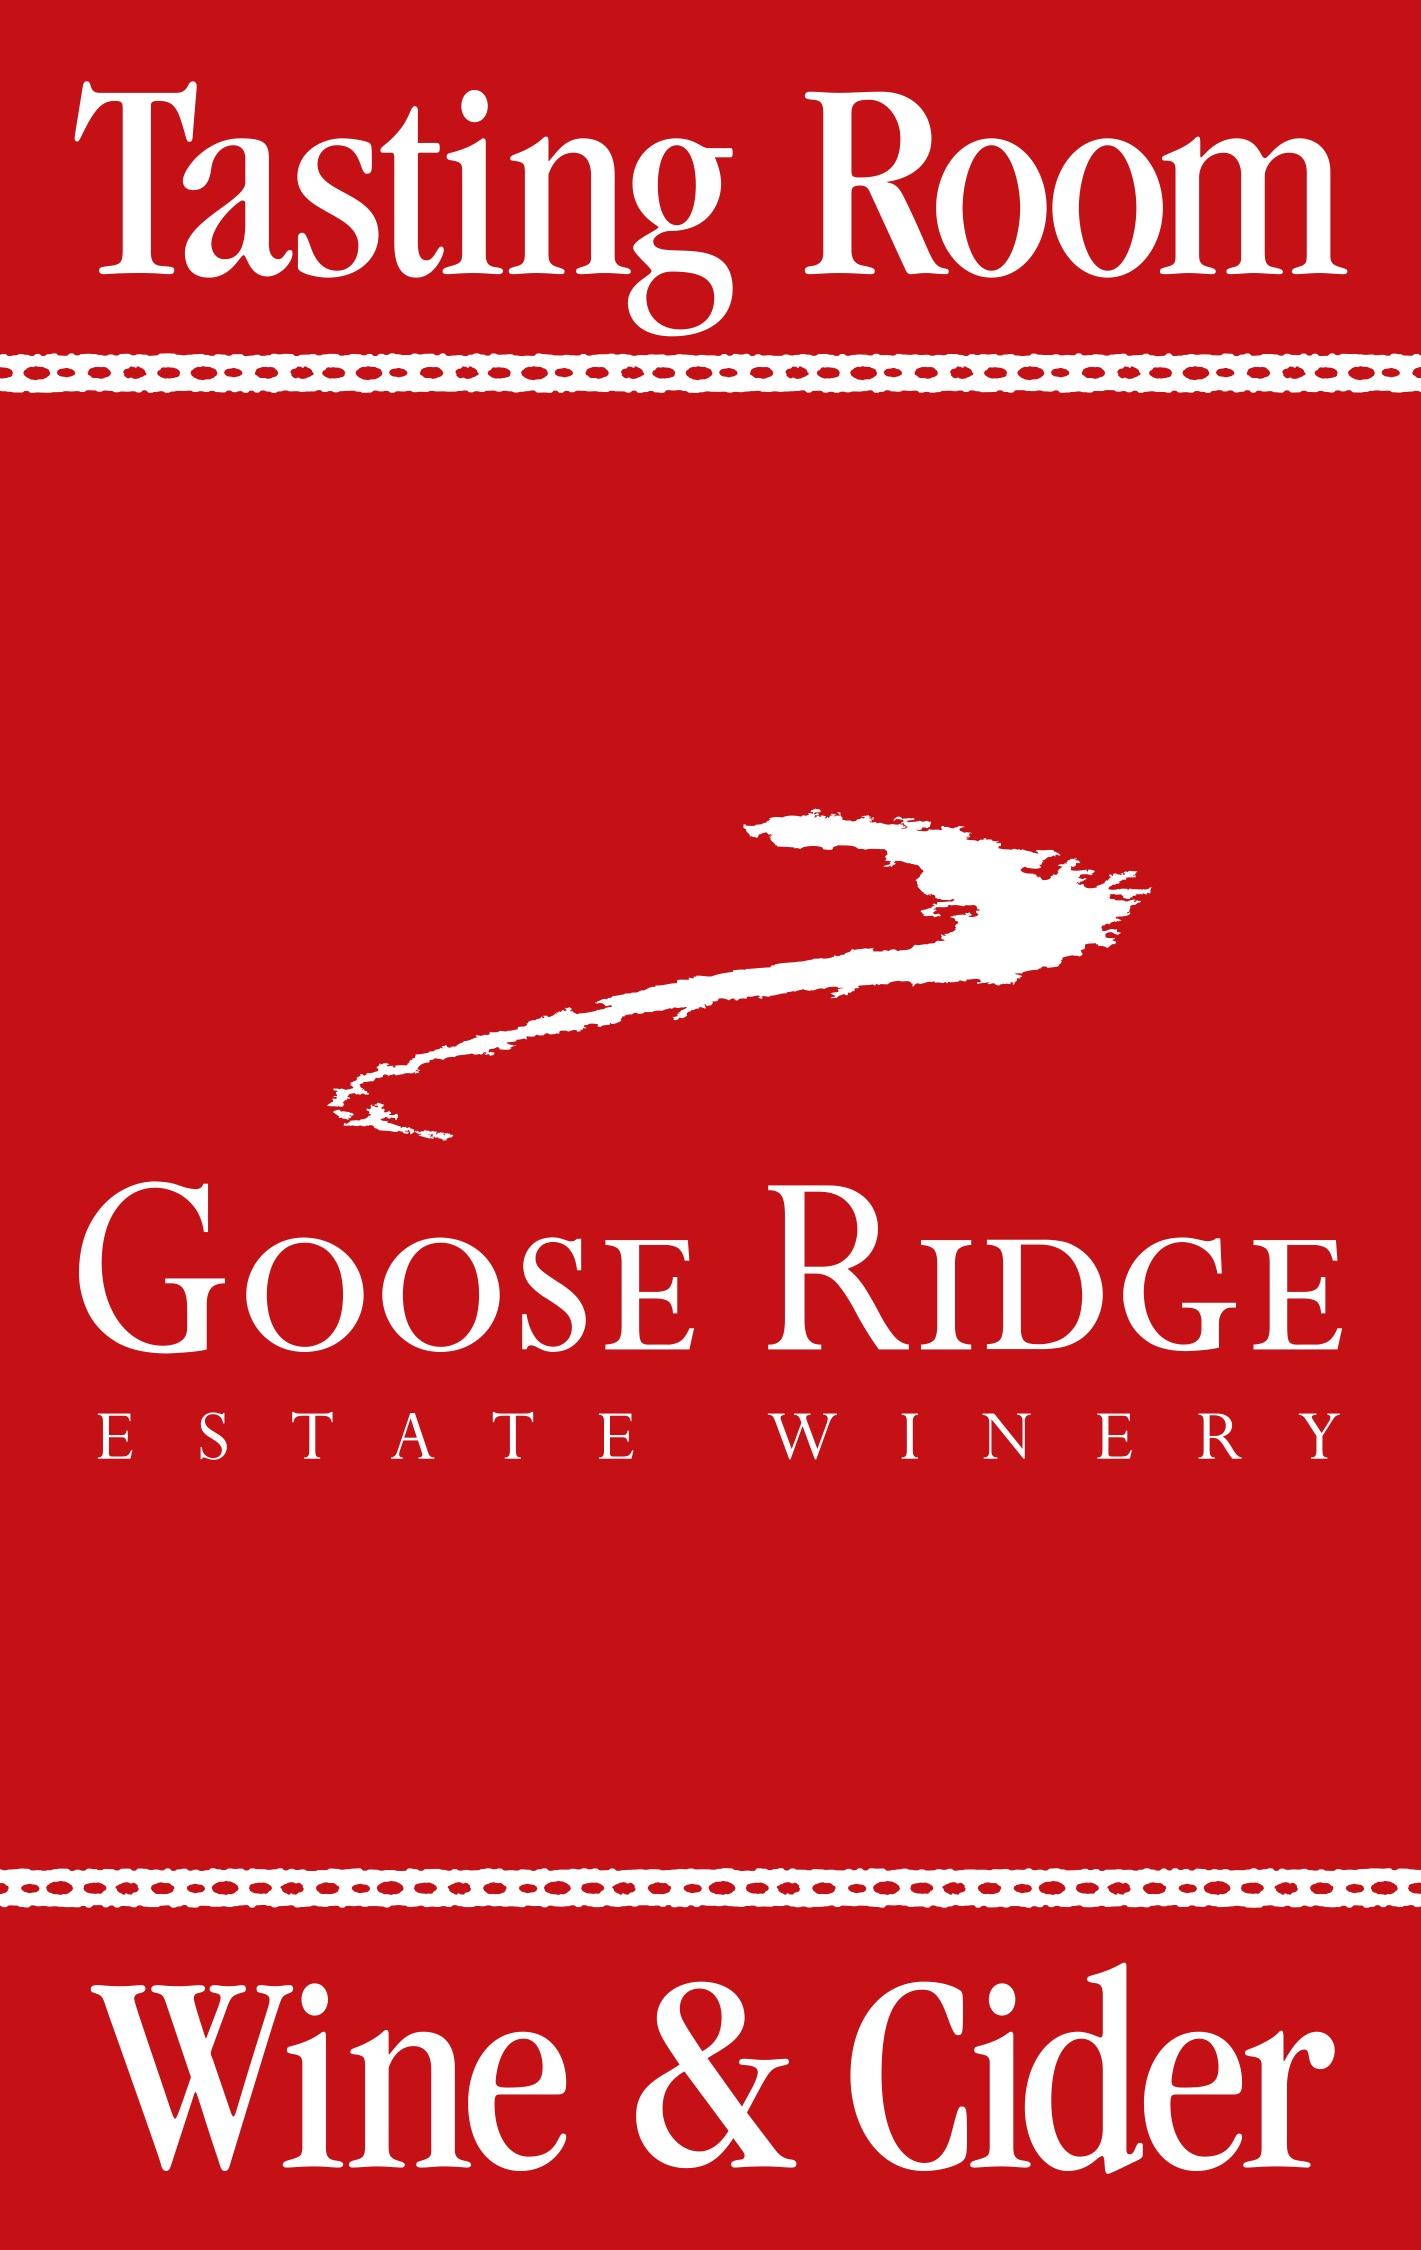 Goose Ridge Sign Options-2.jpg